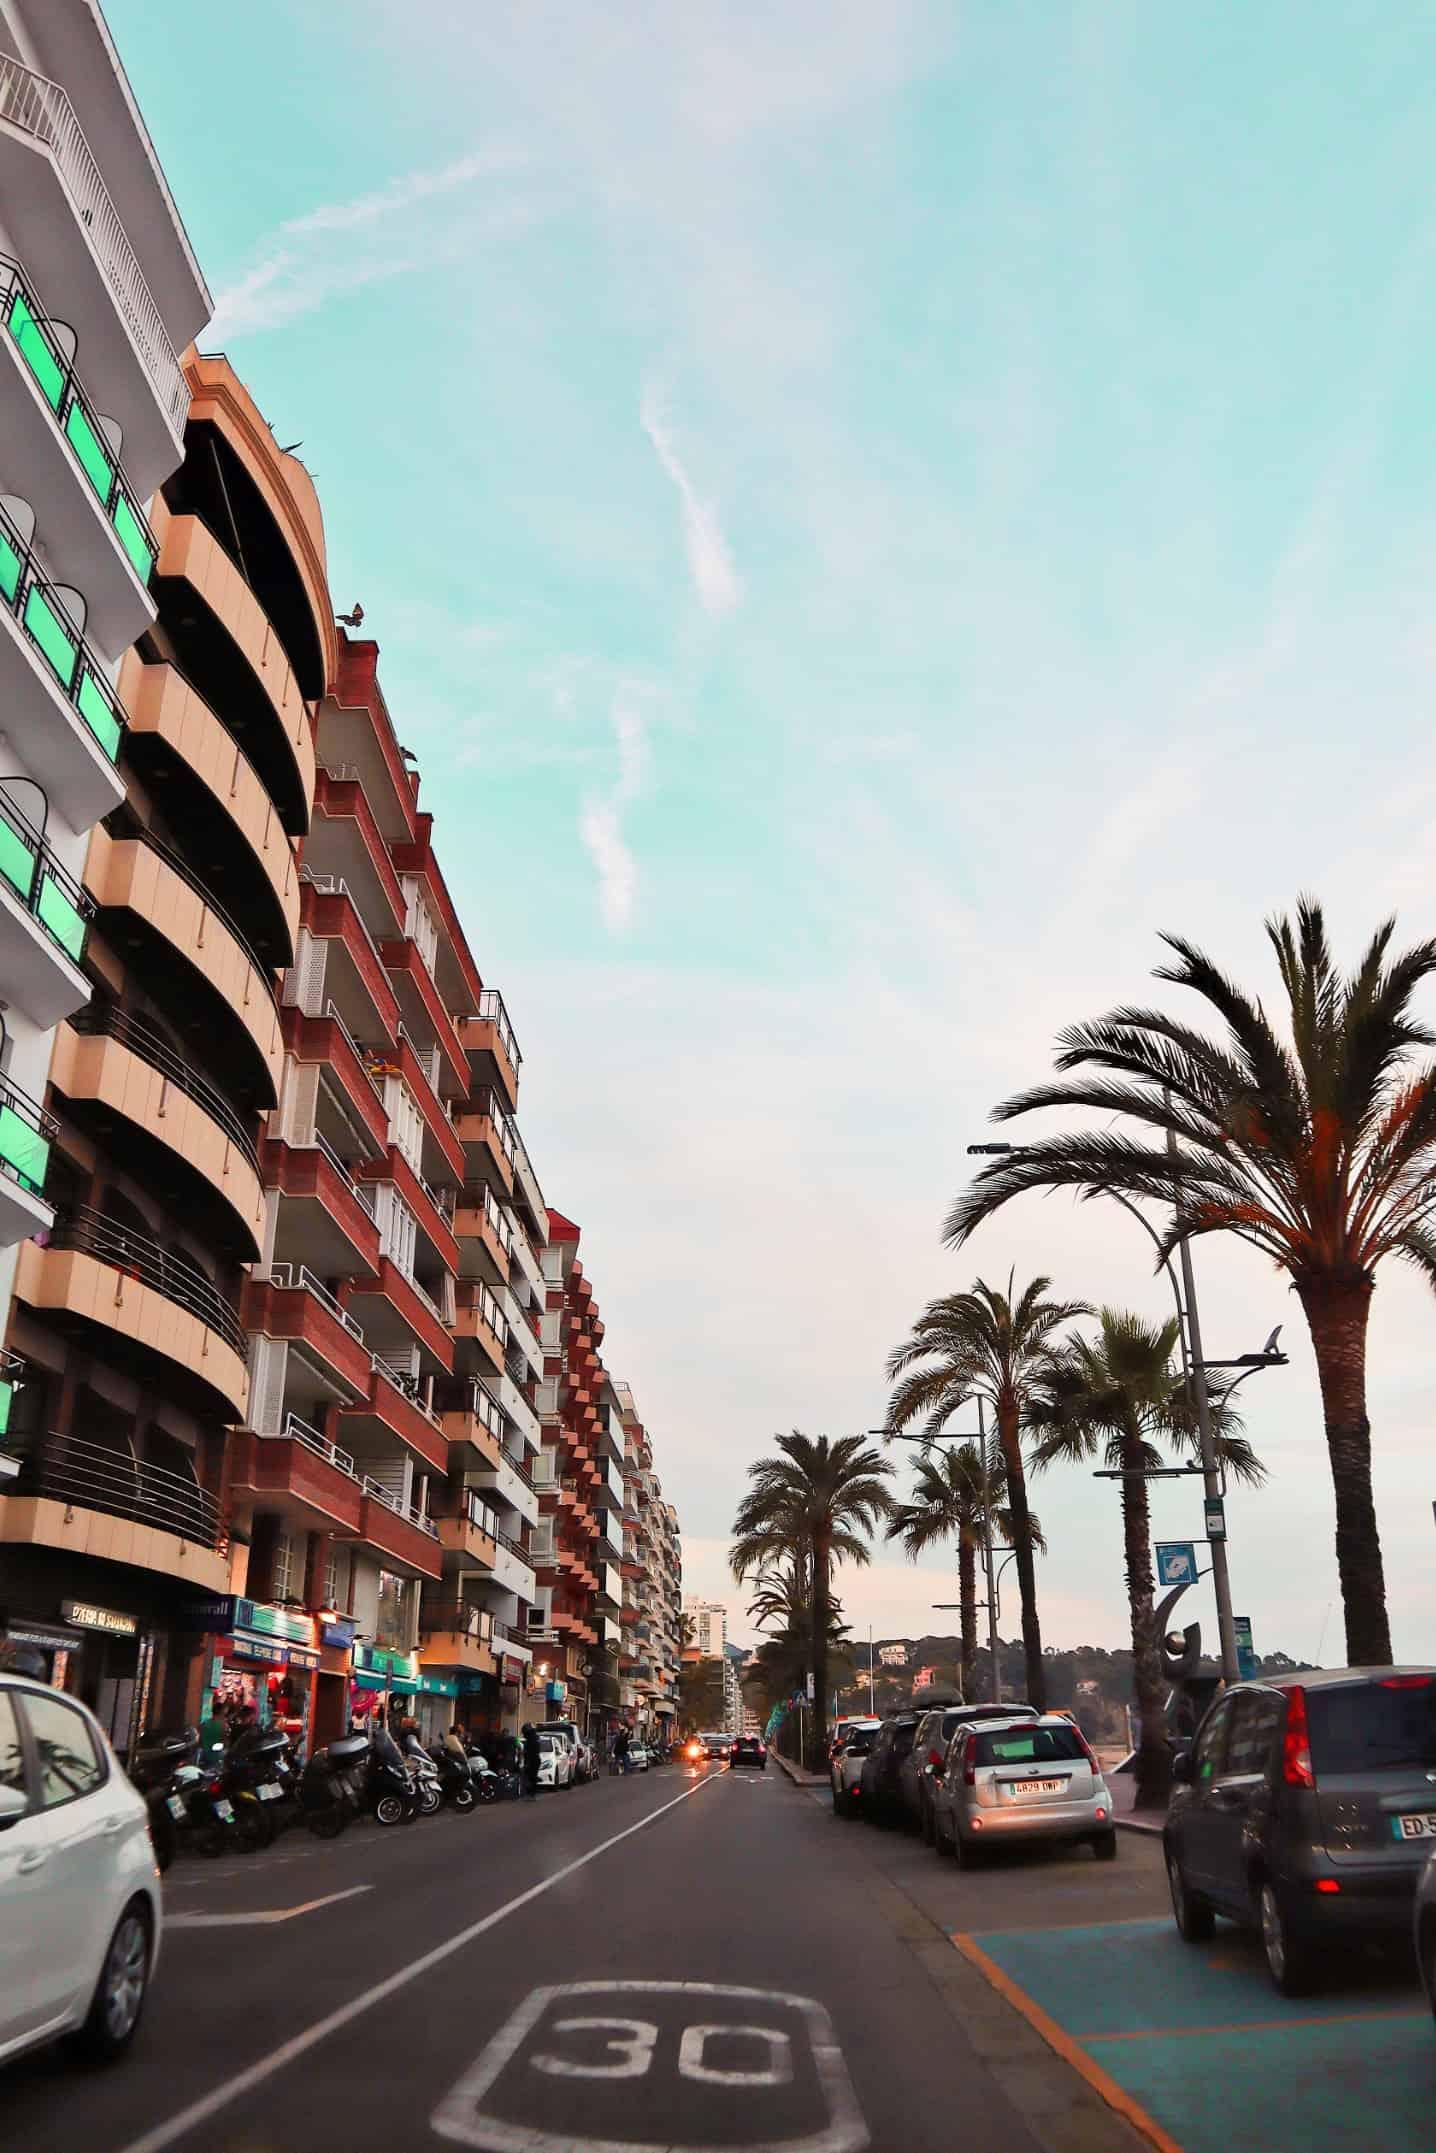 Loret de Mar Costa Brava Spain